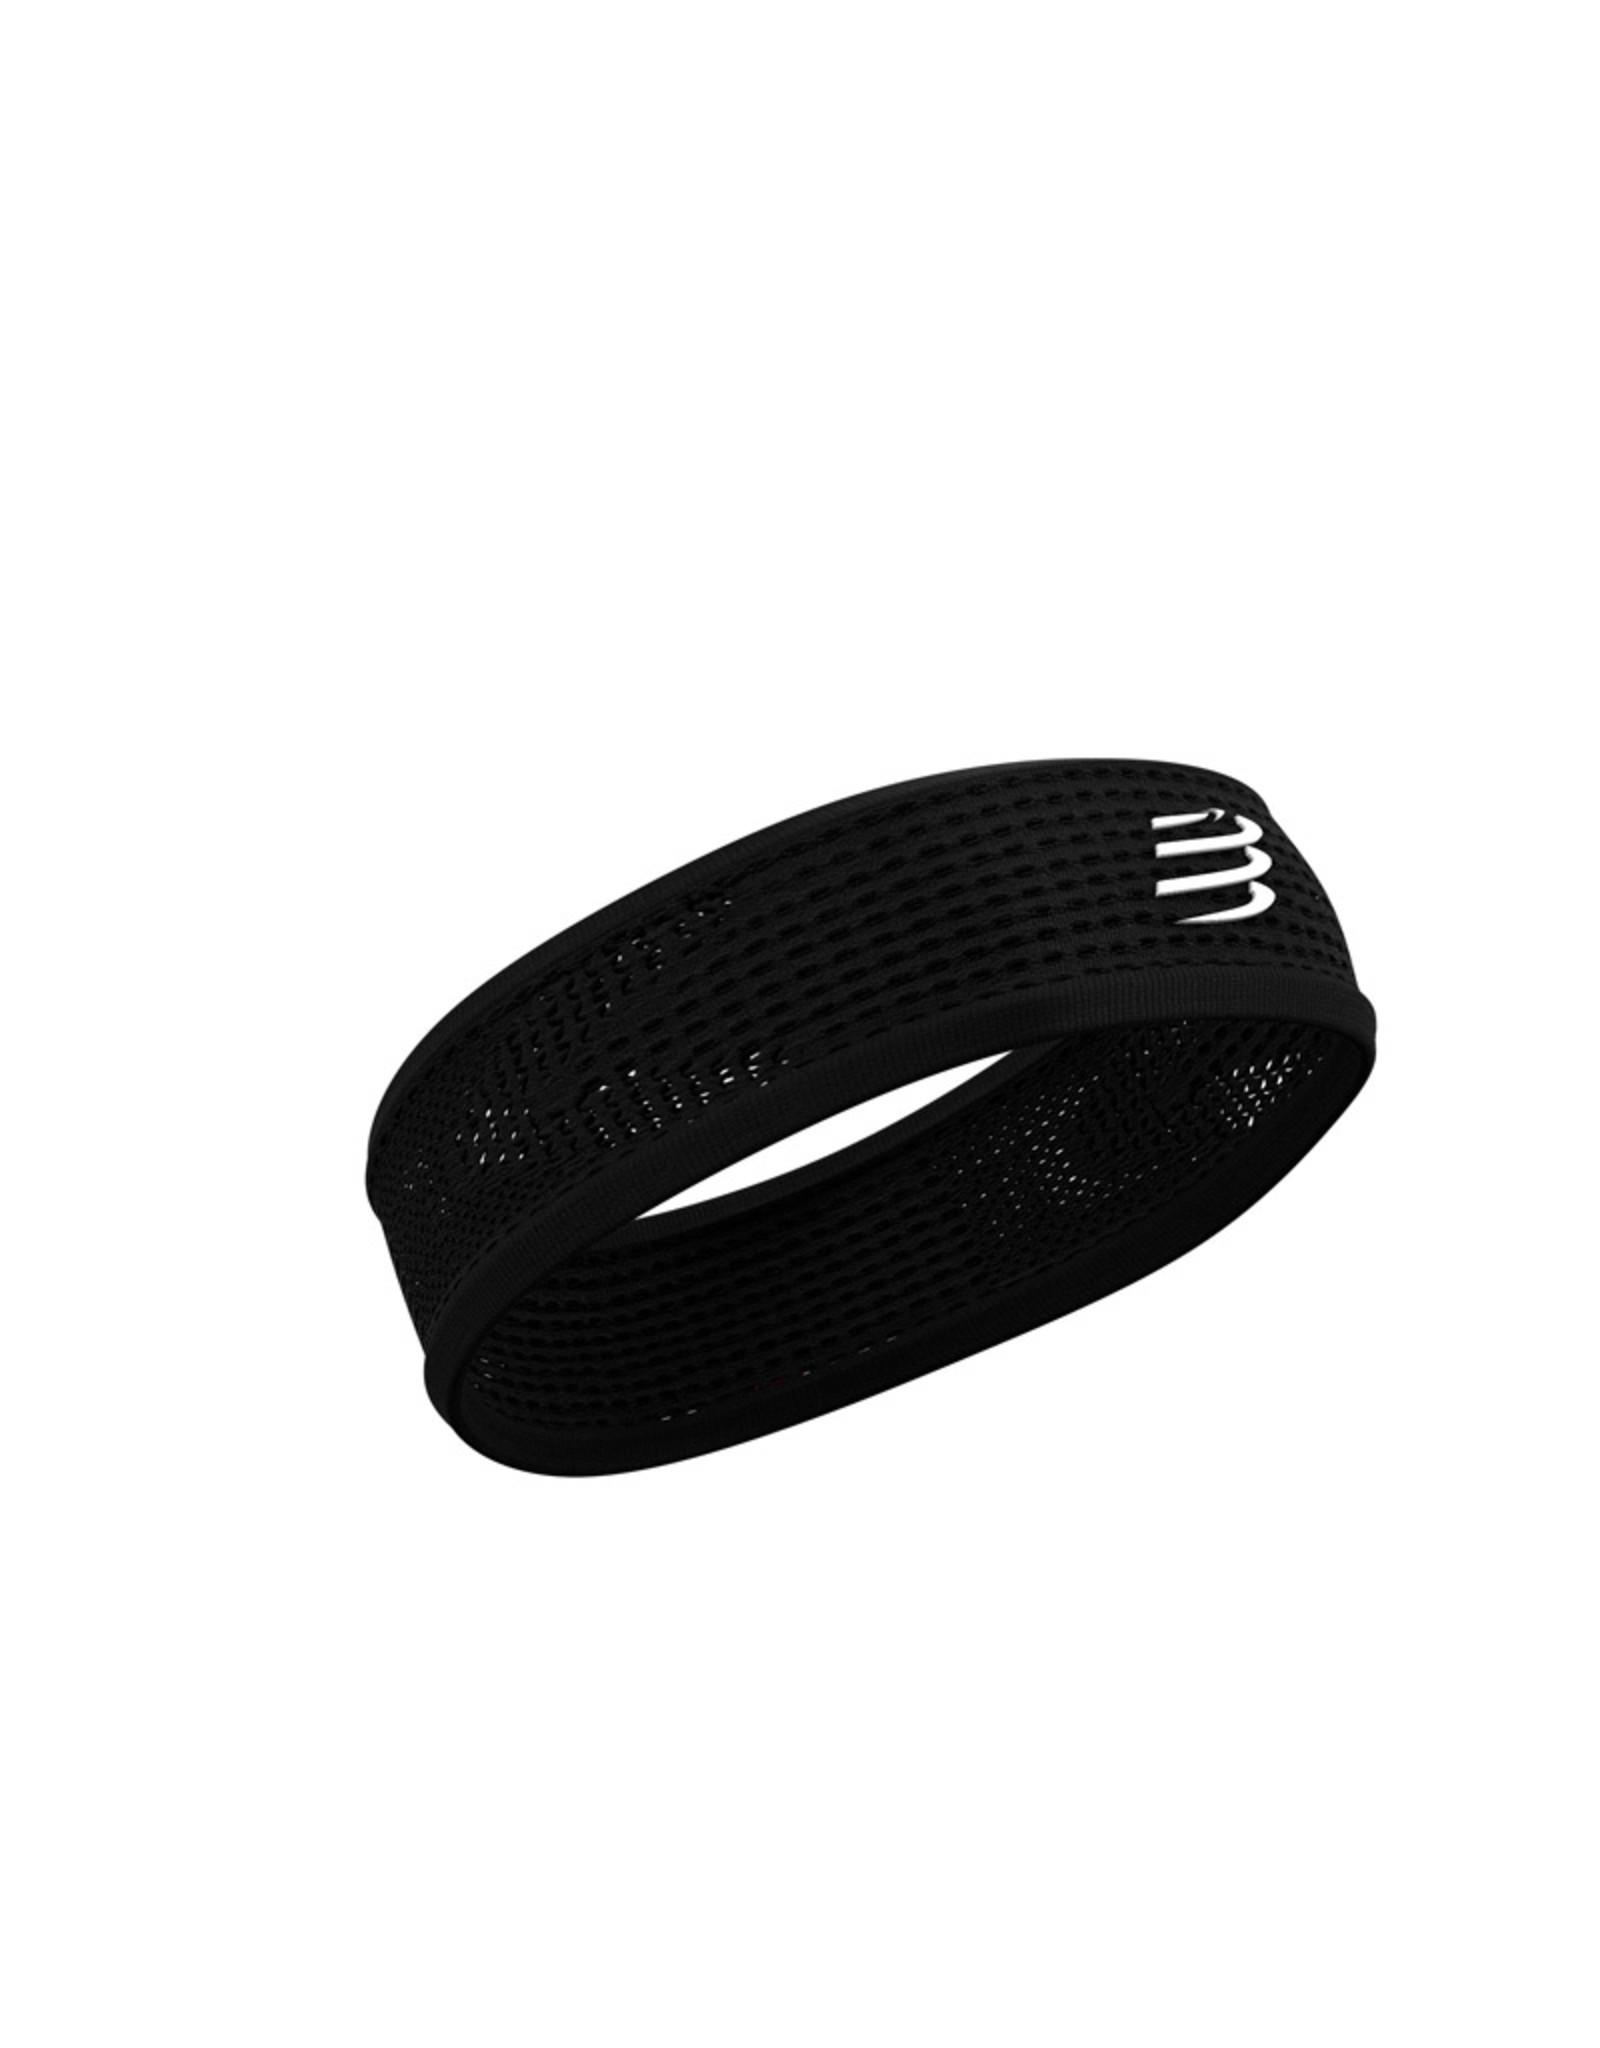 Compressport Thin Headband On/Off - Noir